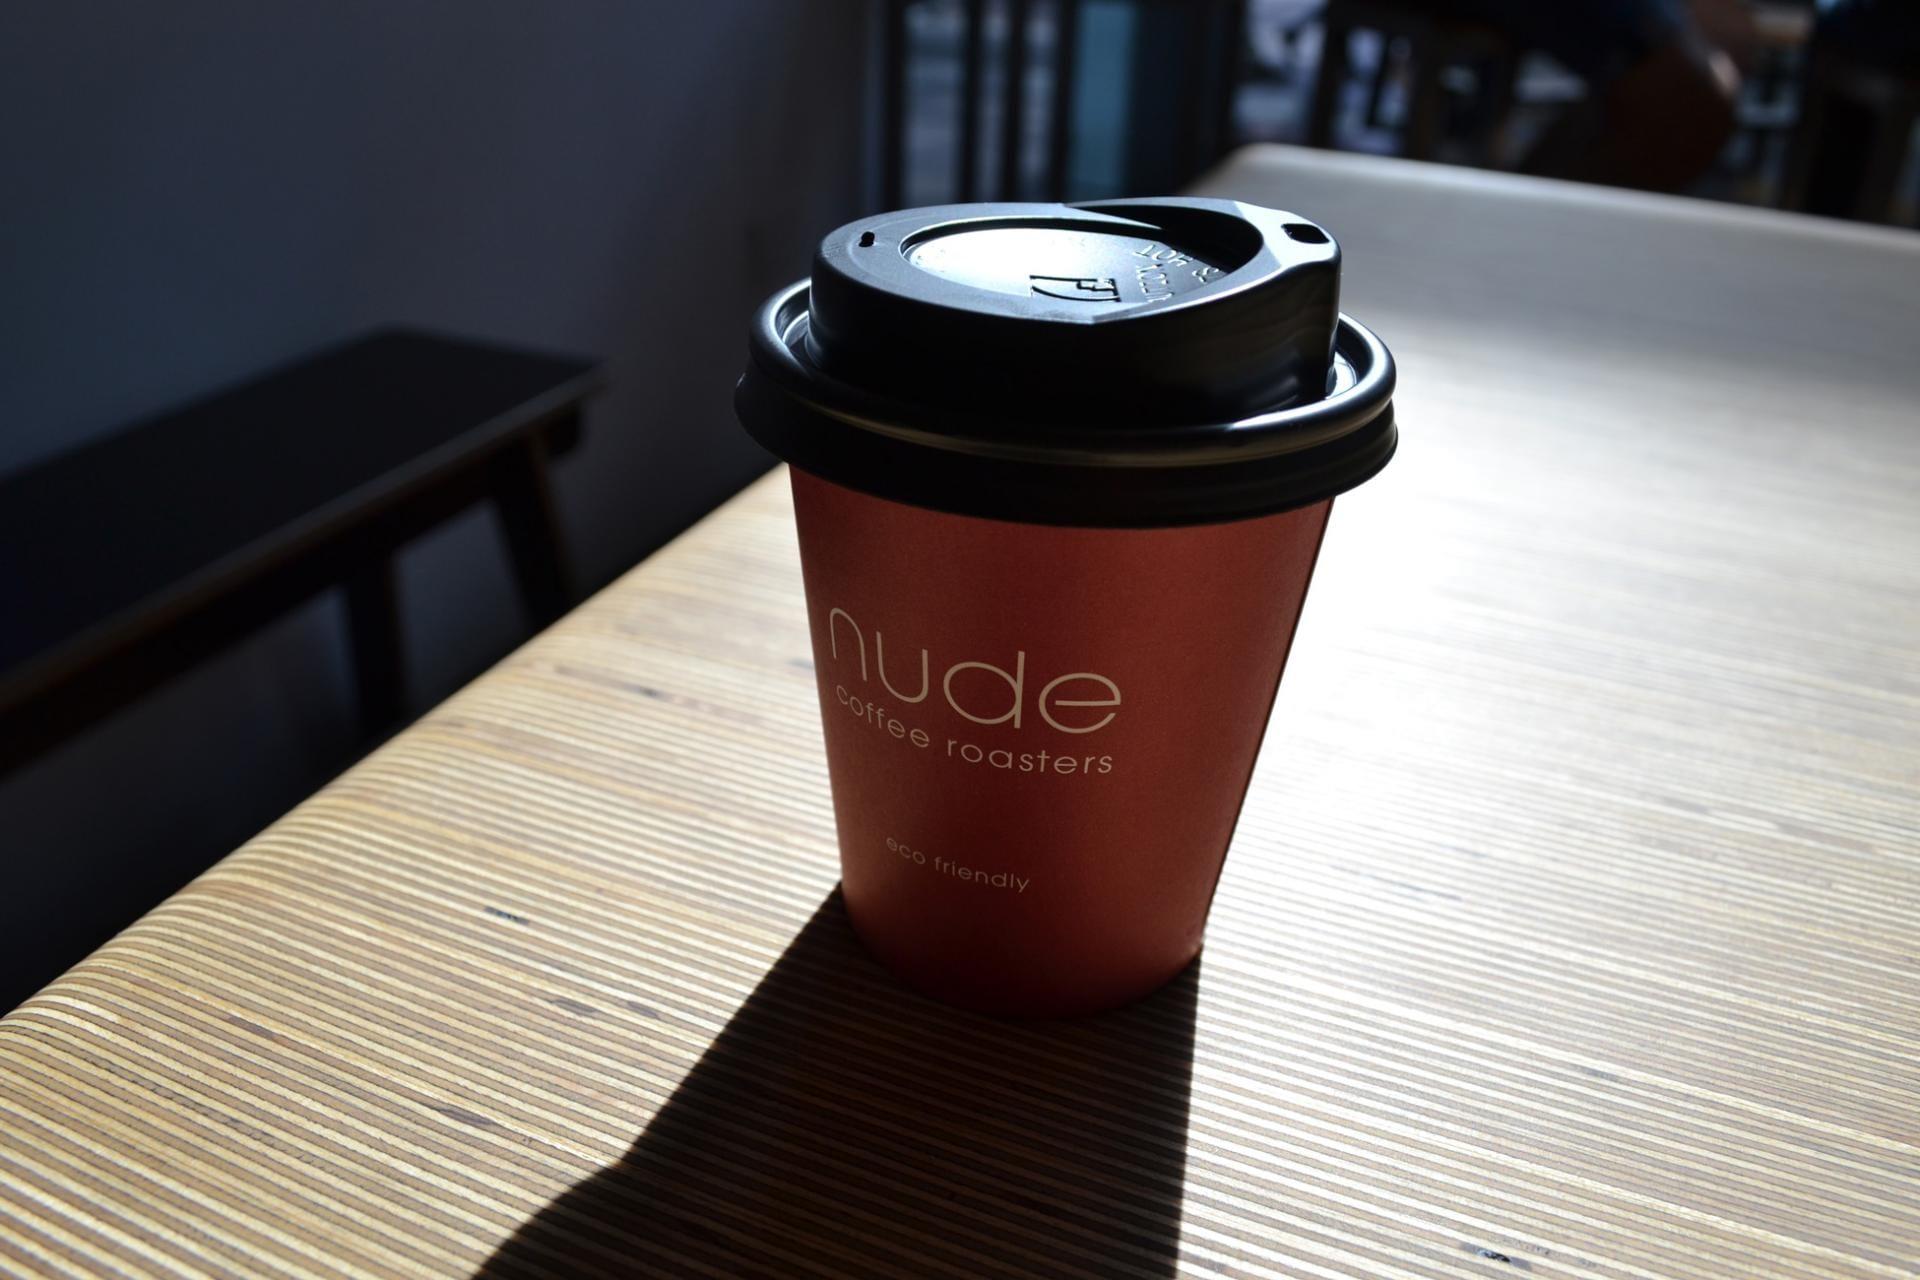 Nude Coffee Roasters London